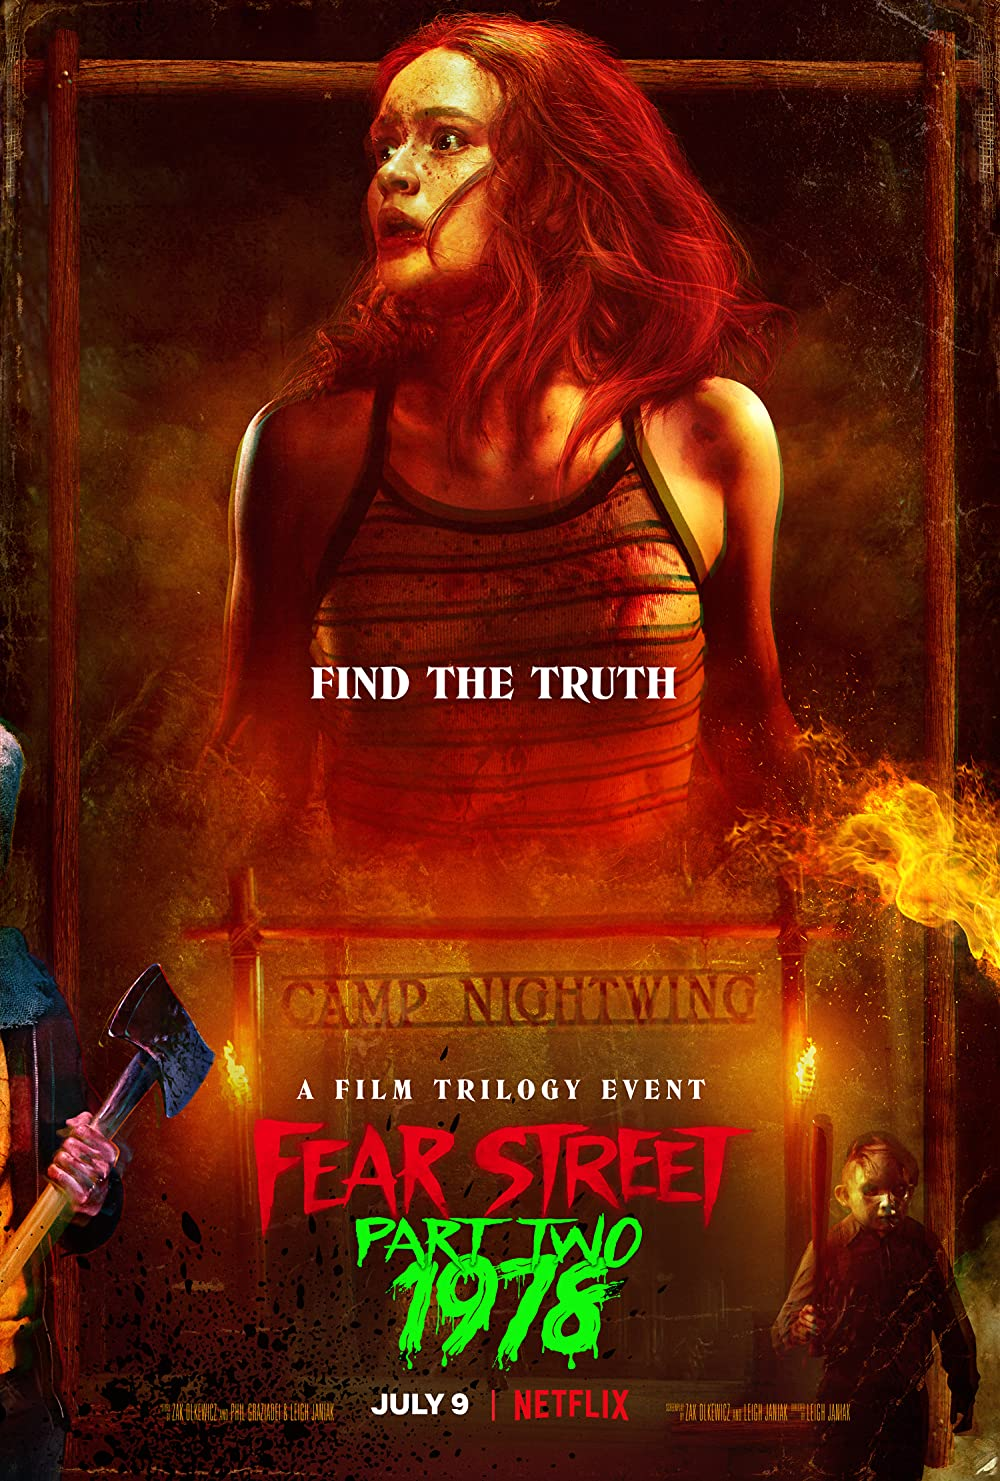 Fear Street Part Two 1978 2021 Hindi ORG Dual Audio 720p NF HDRip MSub 800MB x264 AAC